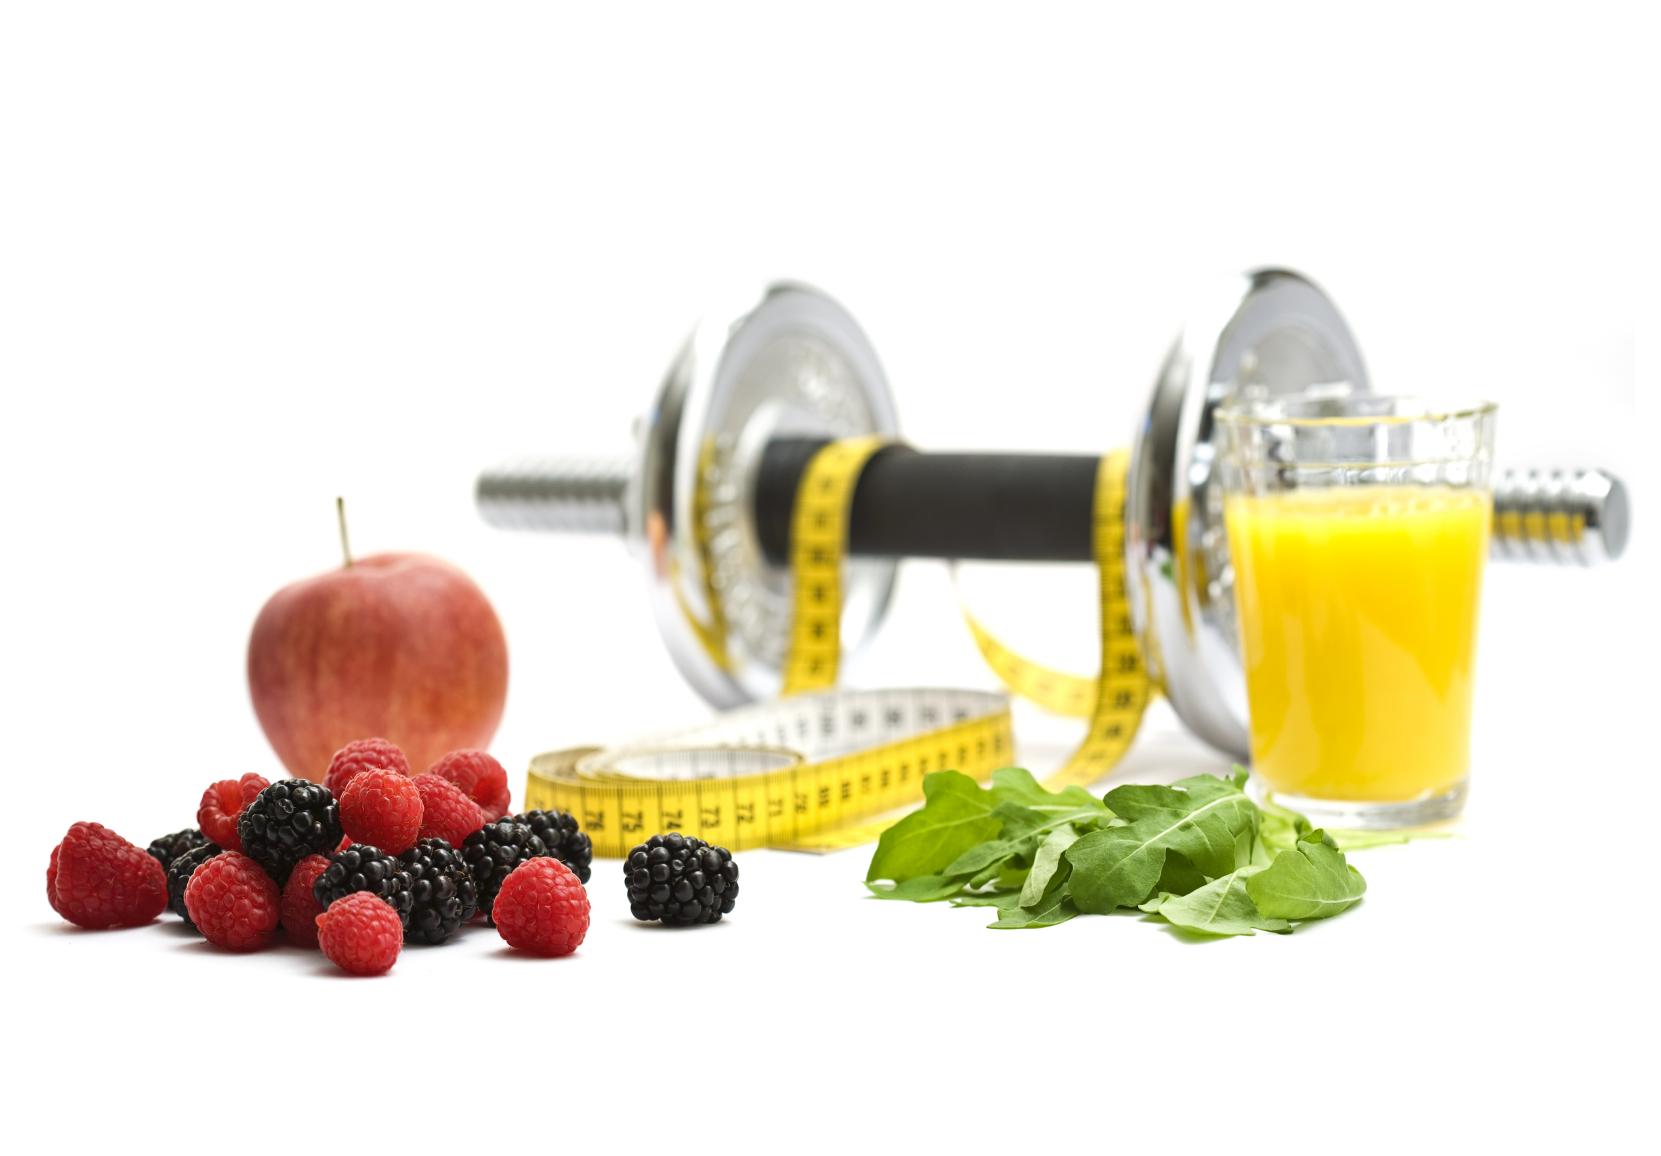 nutrition-bts-dietetique-devenir-coach-sportif-diplome-bpjeps-agff-bp-formation-coach-sportif-v3